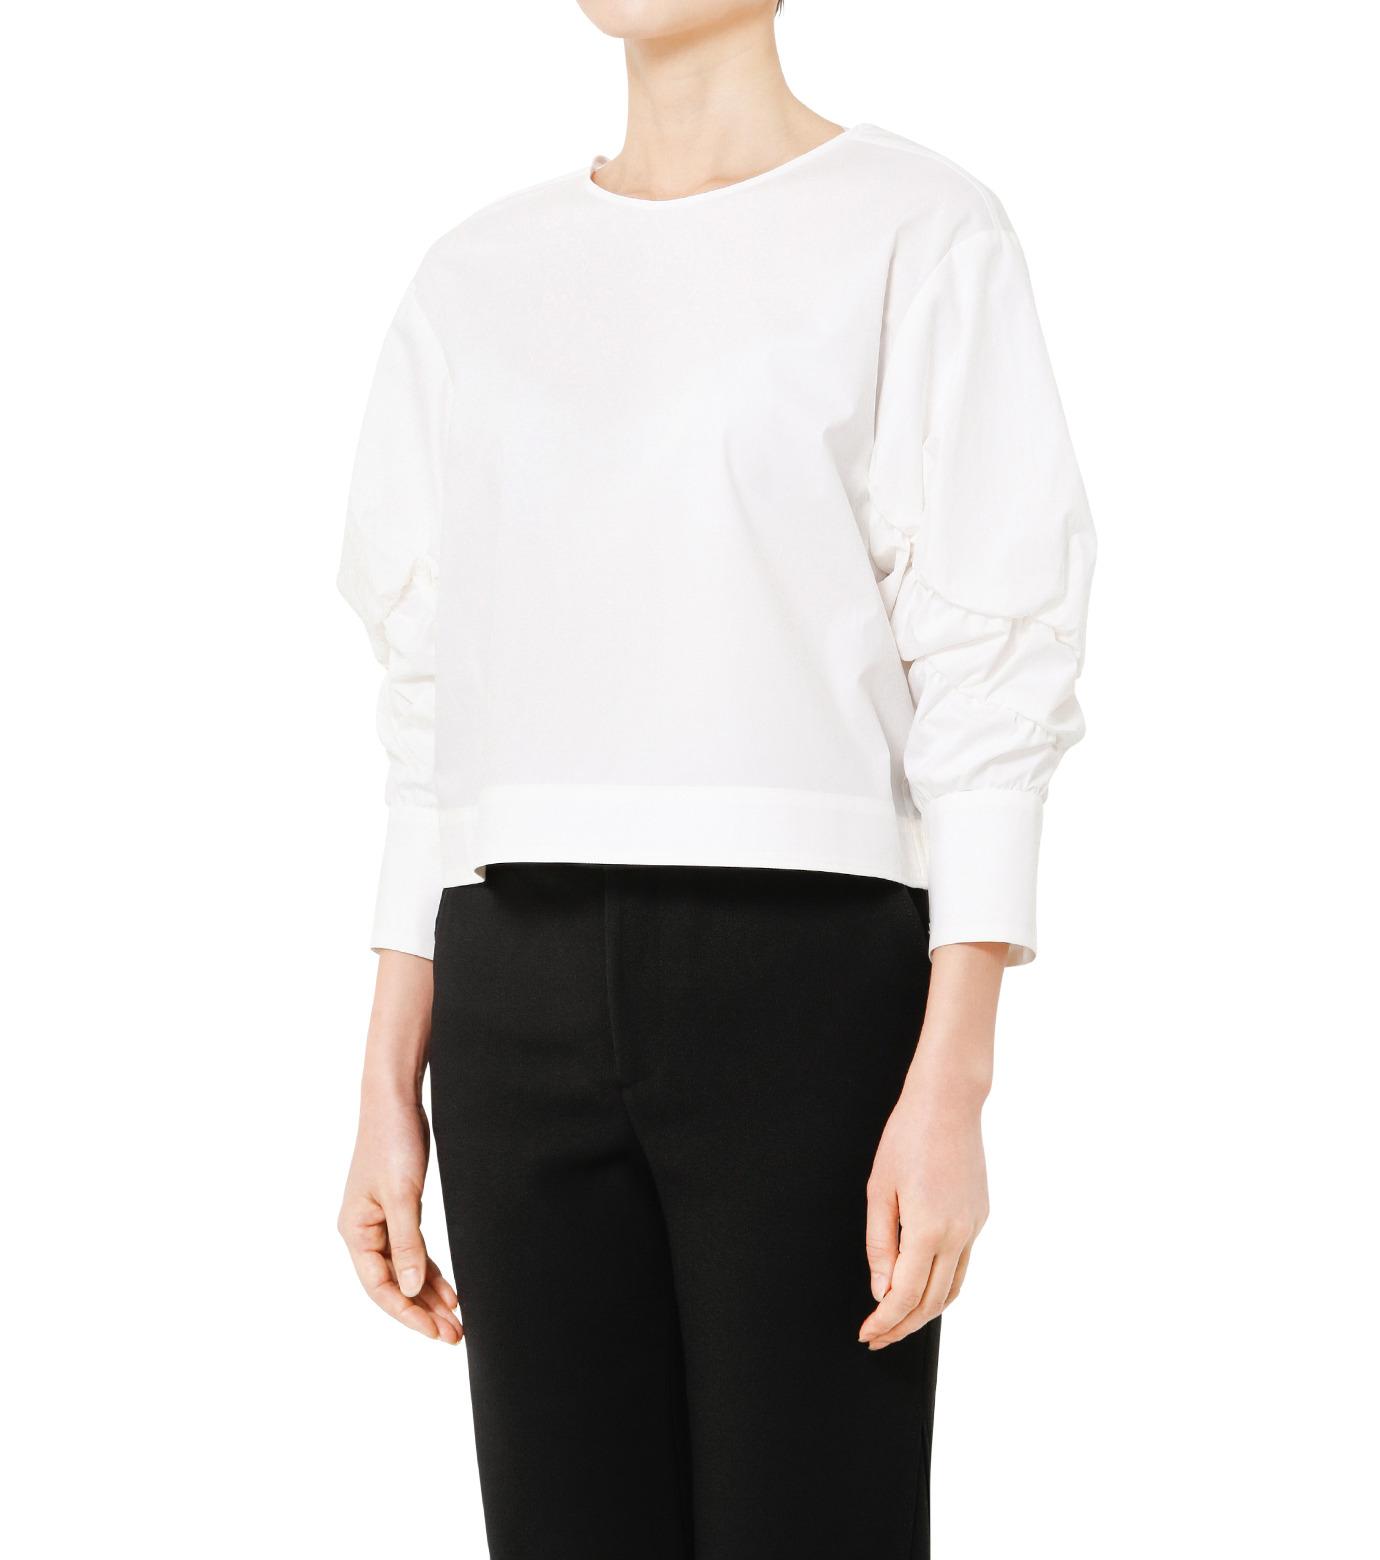 LE CIEL BLEU(ルシェルブルー)のタイプライターシュリンクスリーブトップス-WHITE(シャツ/shirt)-19S63104 拡大詳細画像3